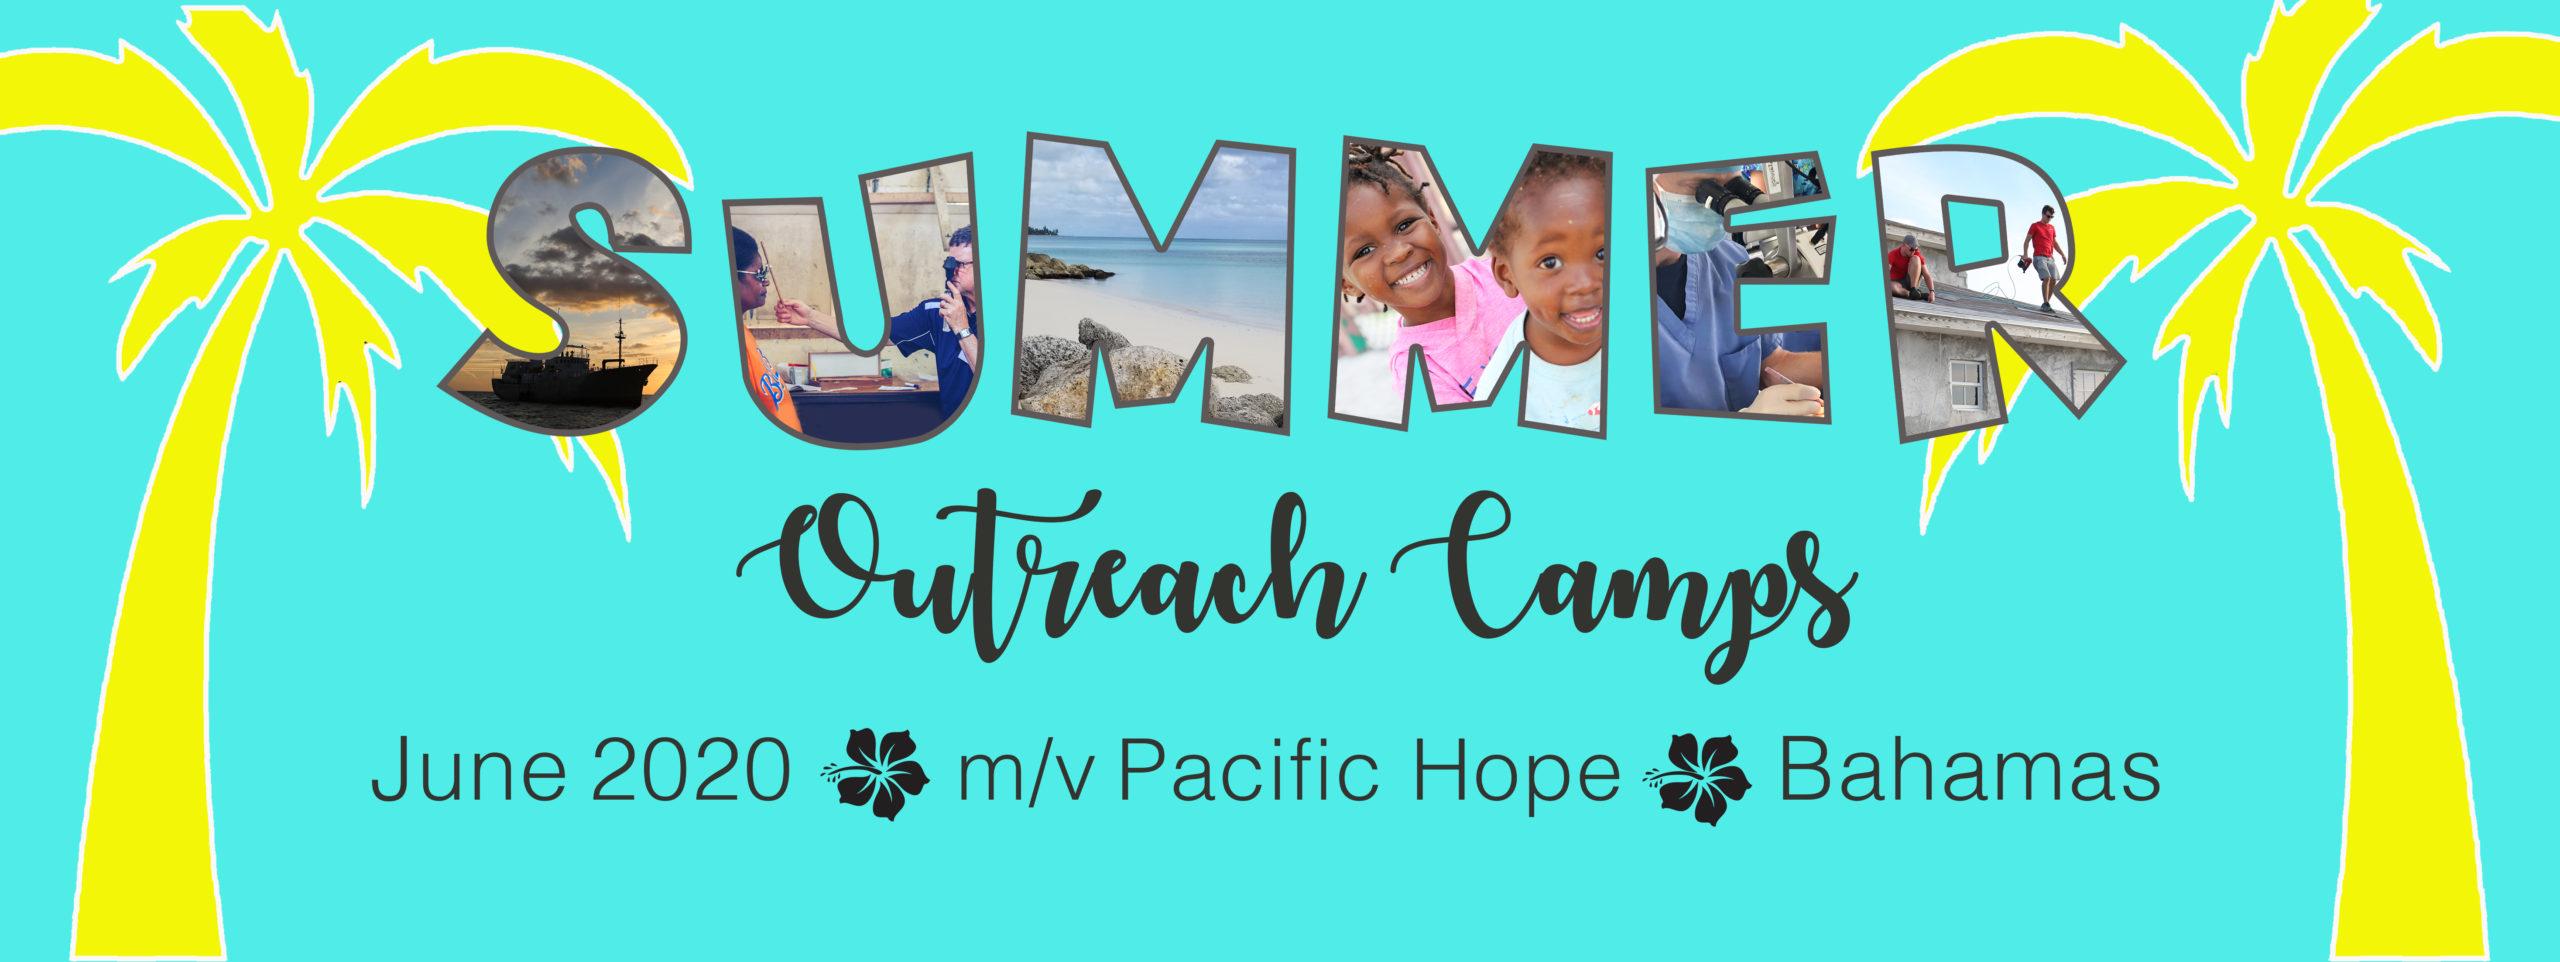 Summer Camps Banner June 2020